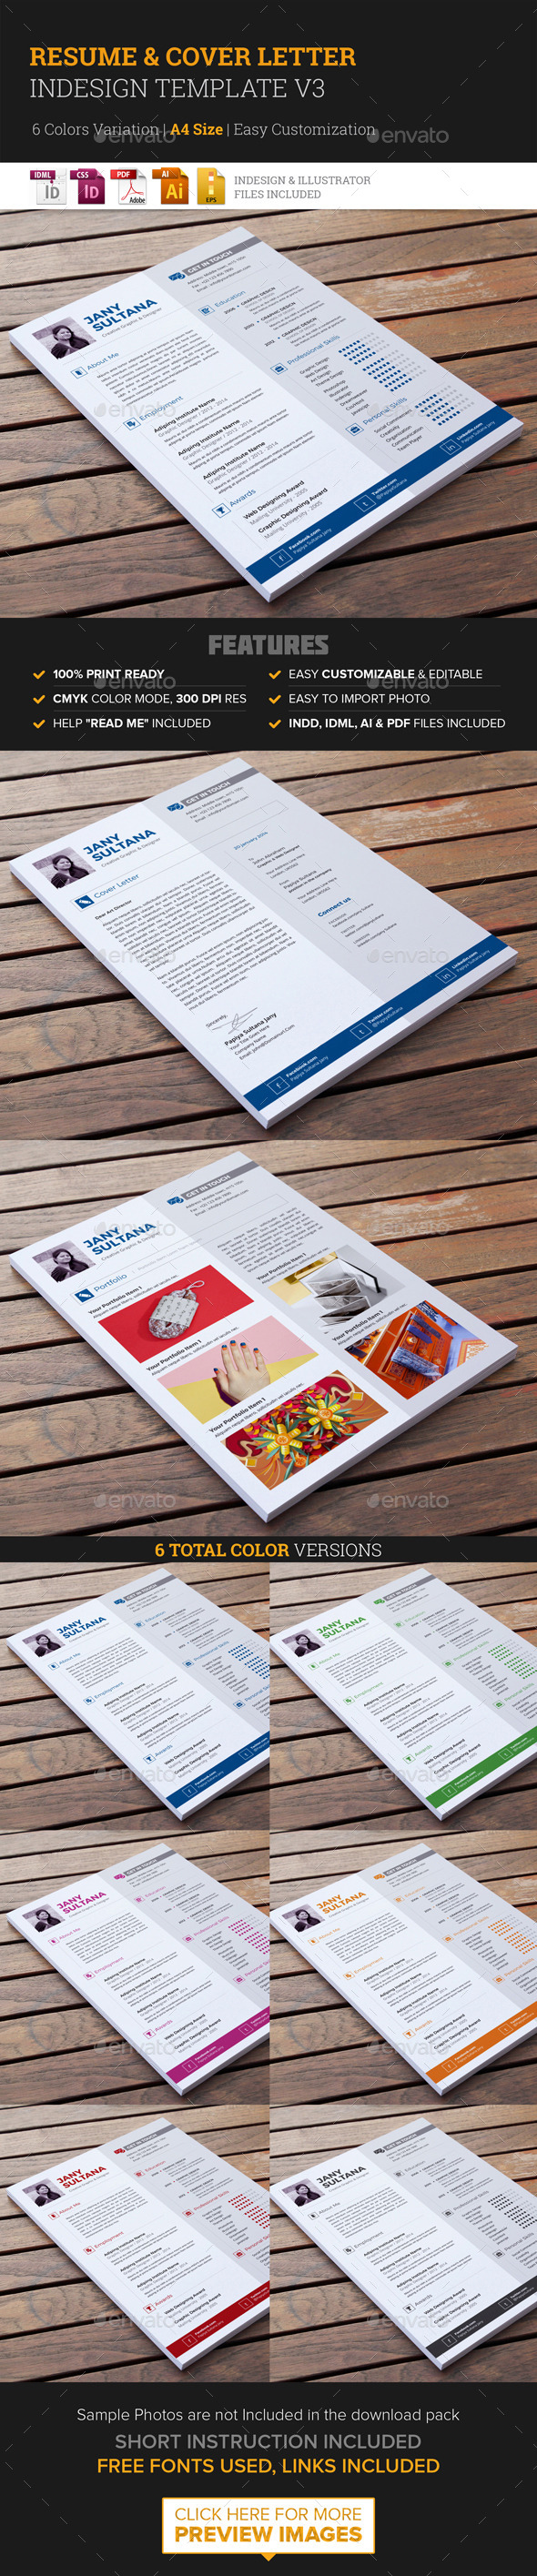 Resume & Cover Letter Template v3  - Resumes Stationery